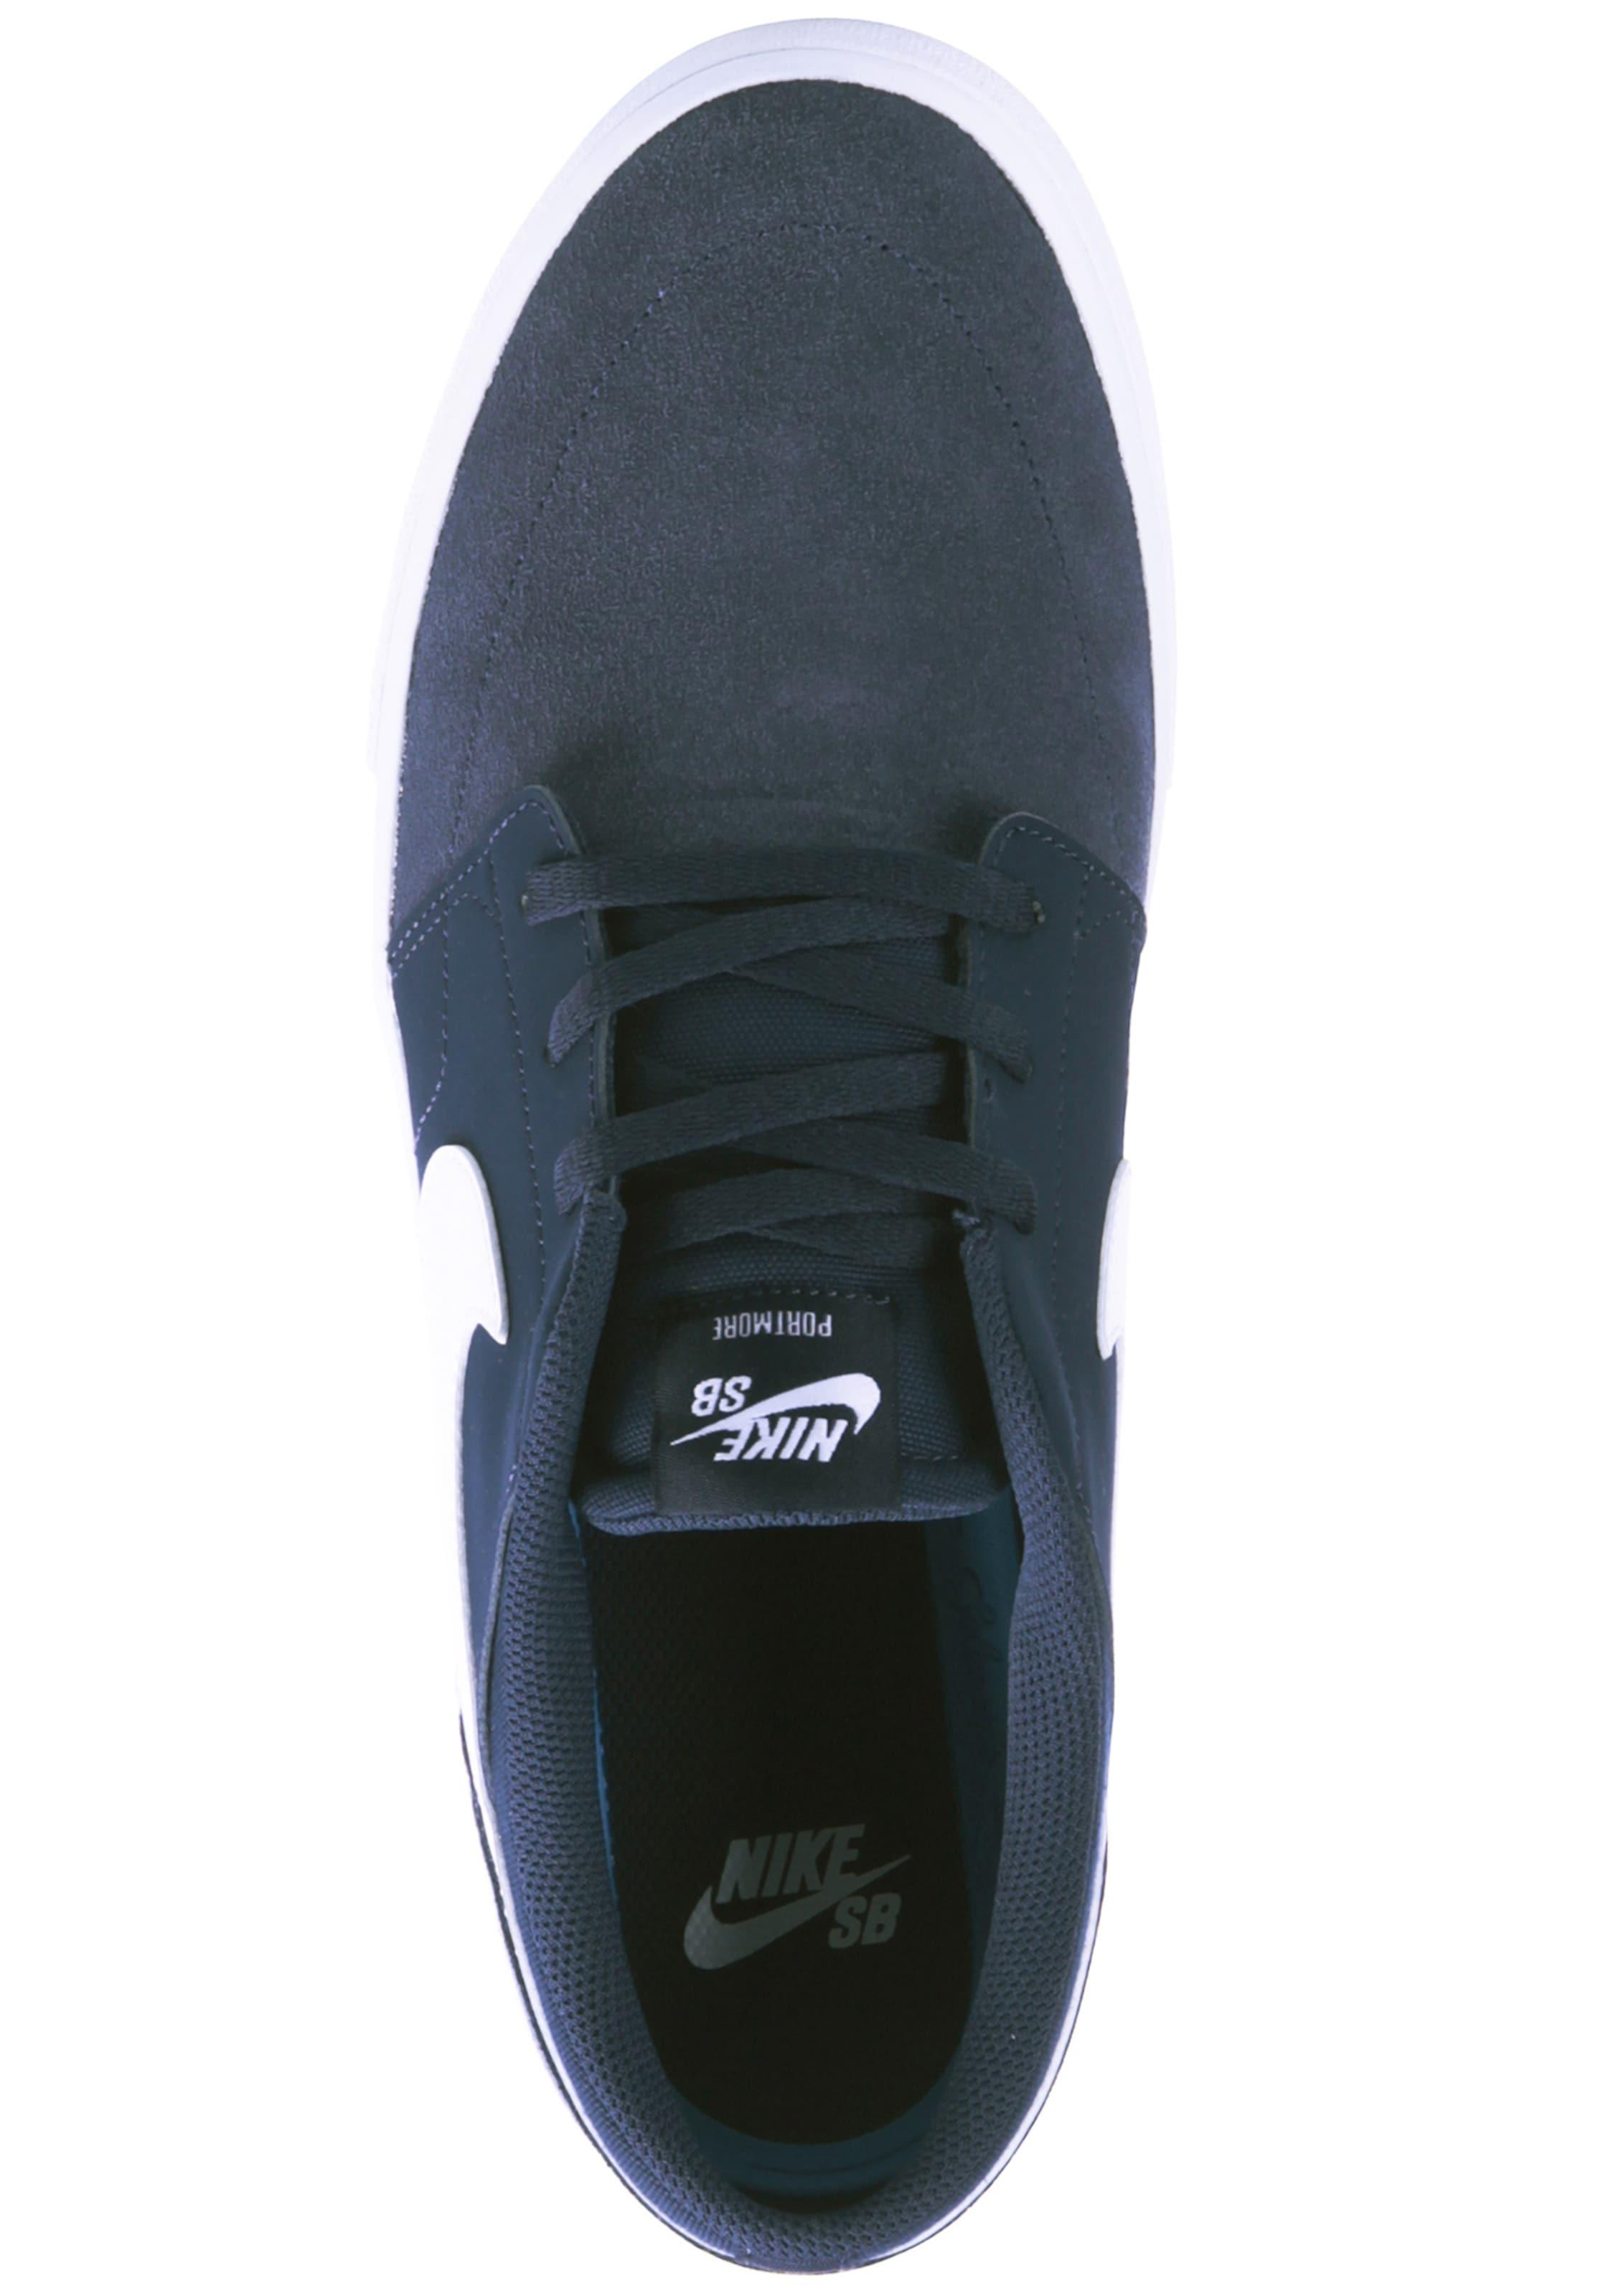 Solar Dunkelblau Sb Sneaker In Portmore Nike Ii eD9IWEYbH2